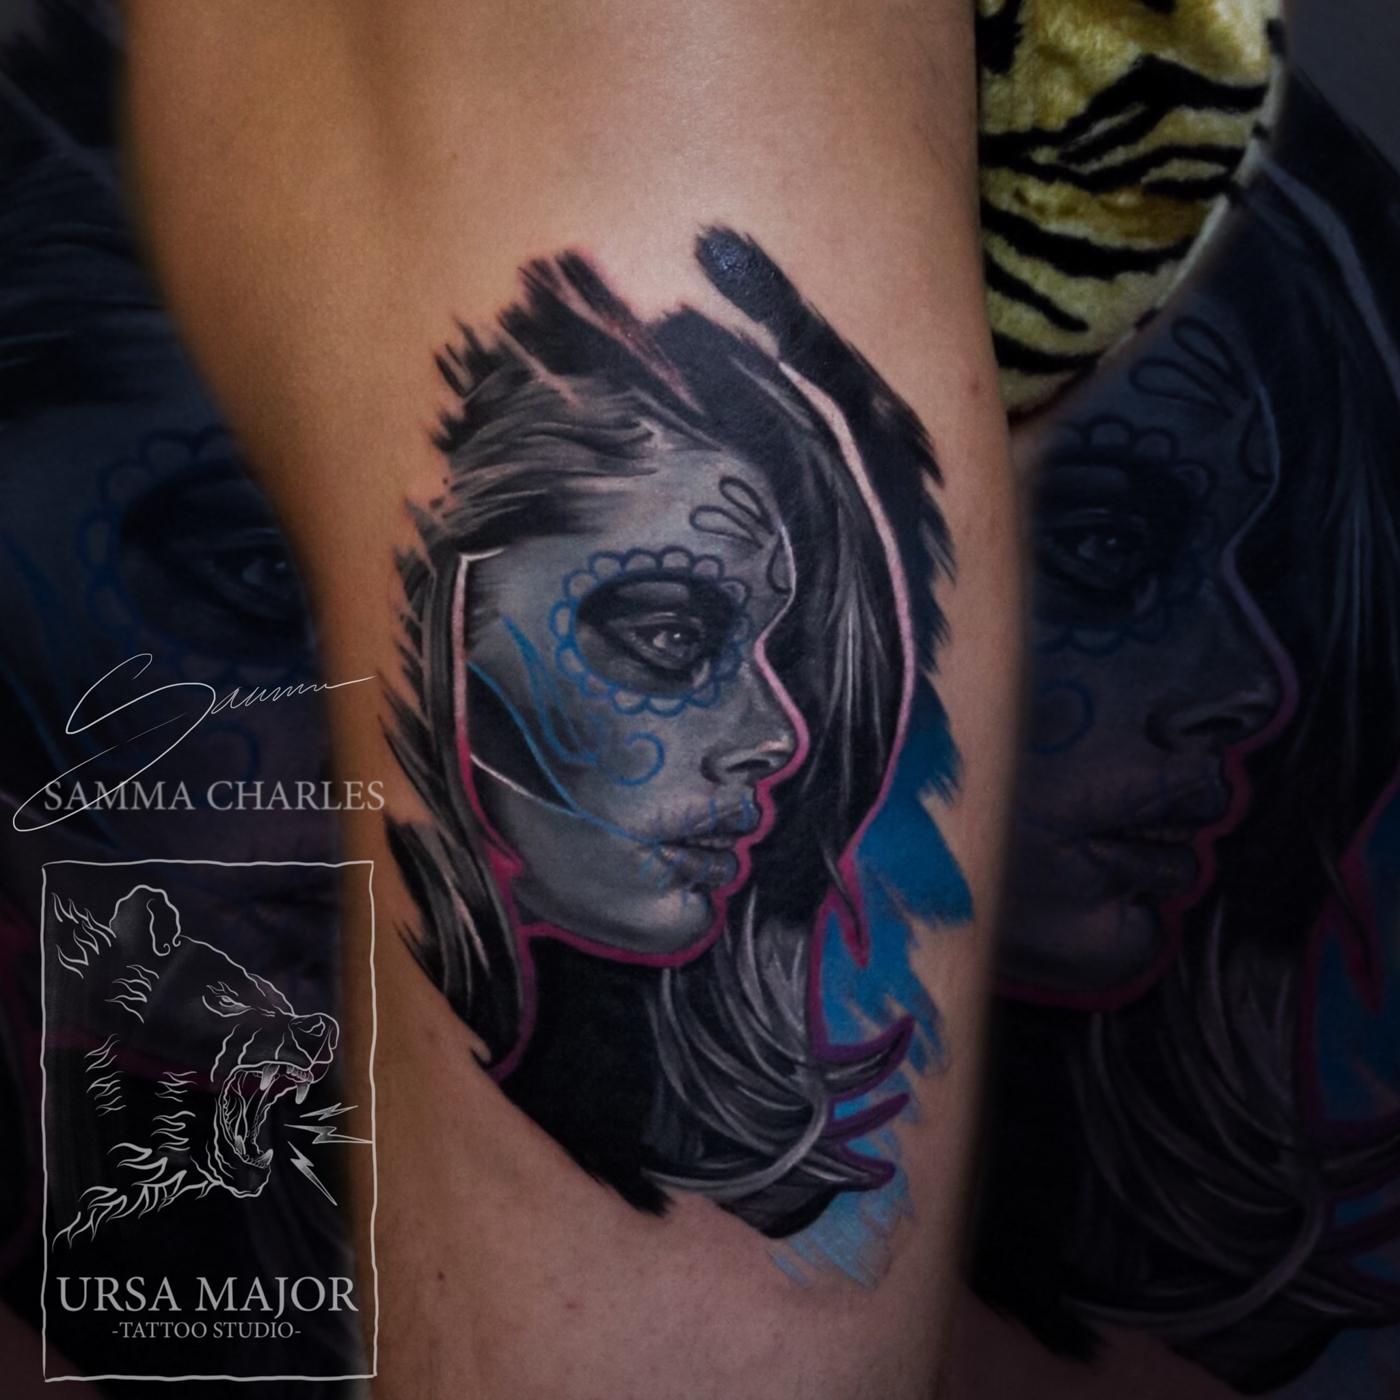 oxfordshire-tattoo-studio-43.jpg